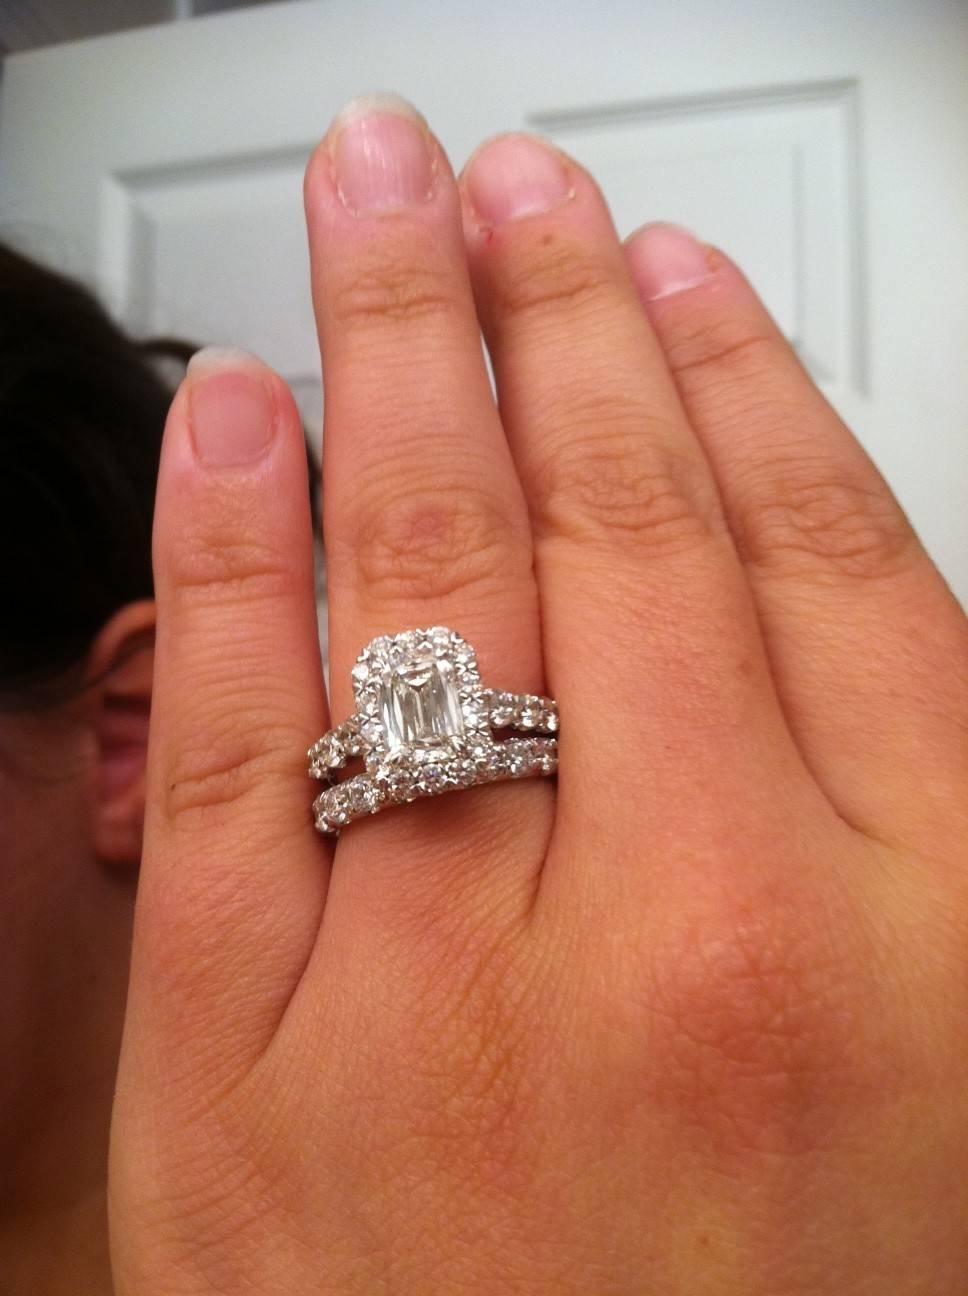 Download 2 Carat Wedding Ring | Wedding Corners In 2 Ct Wedding Rings (View 4 of 15)